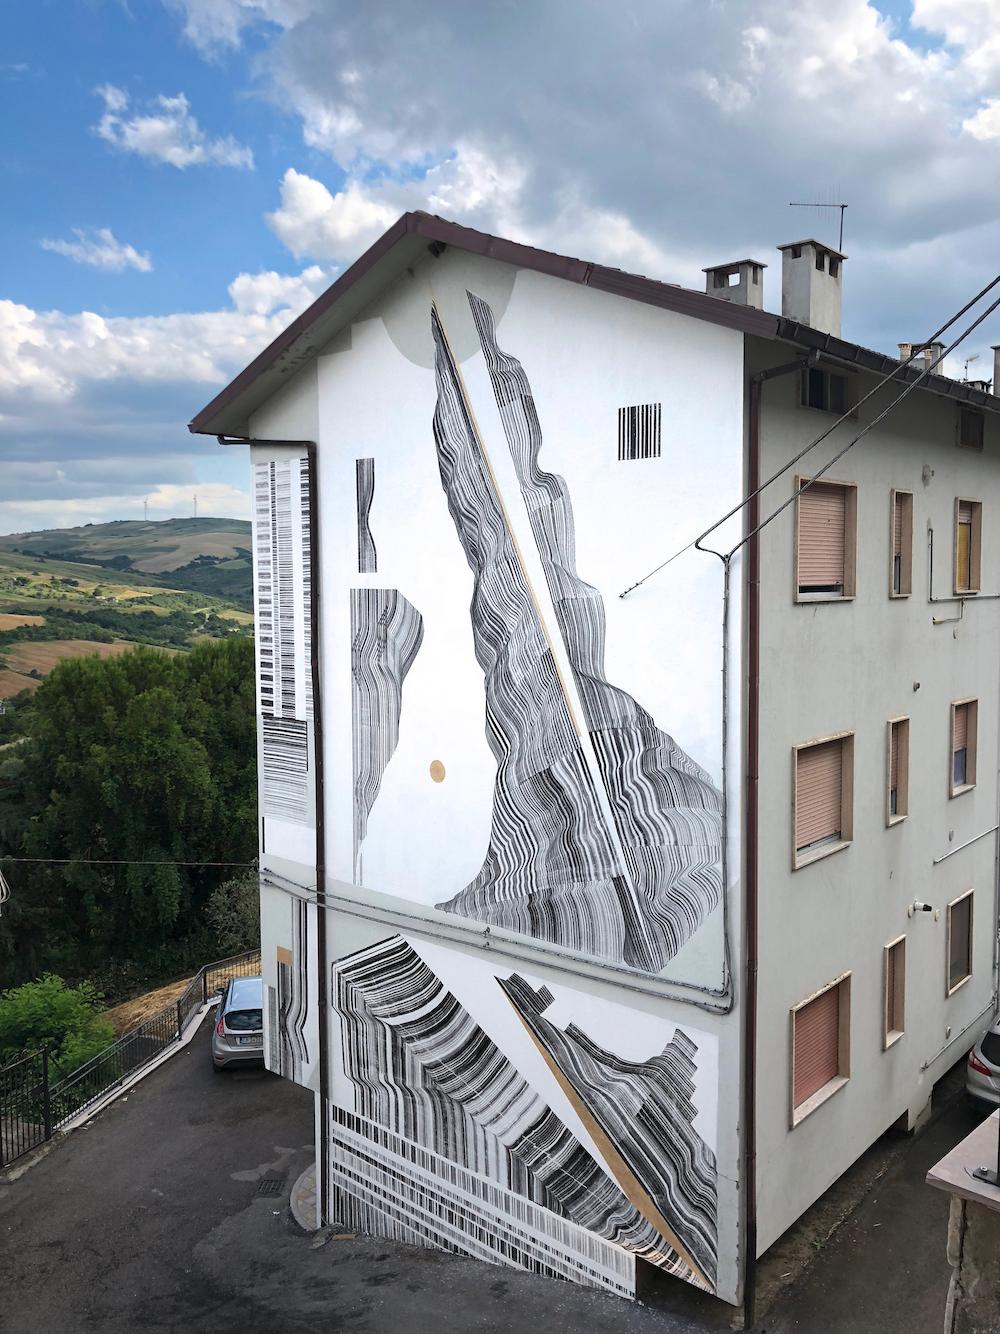 2501 street art in Civitacampomarano